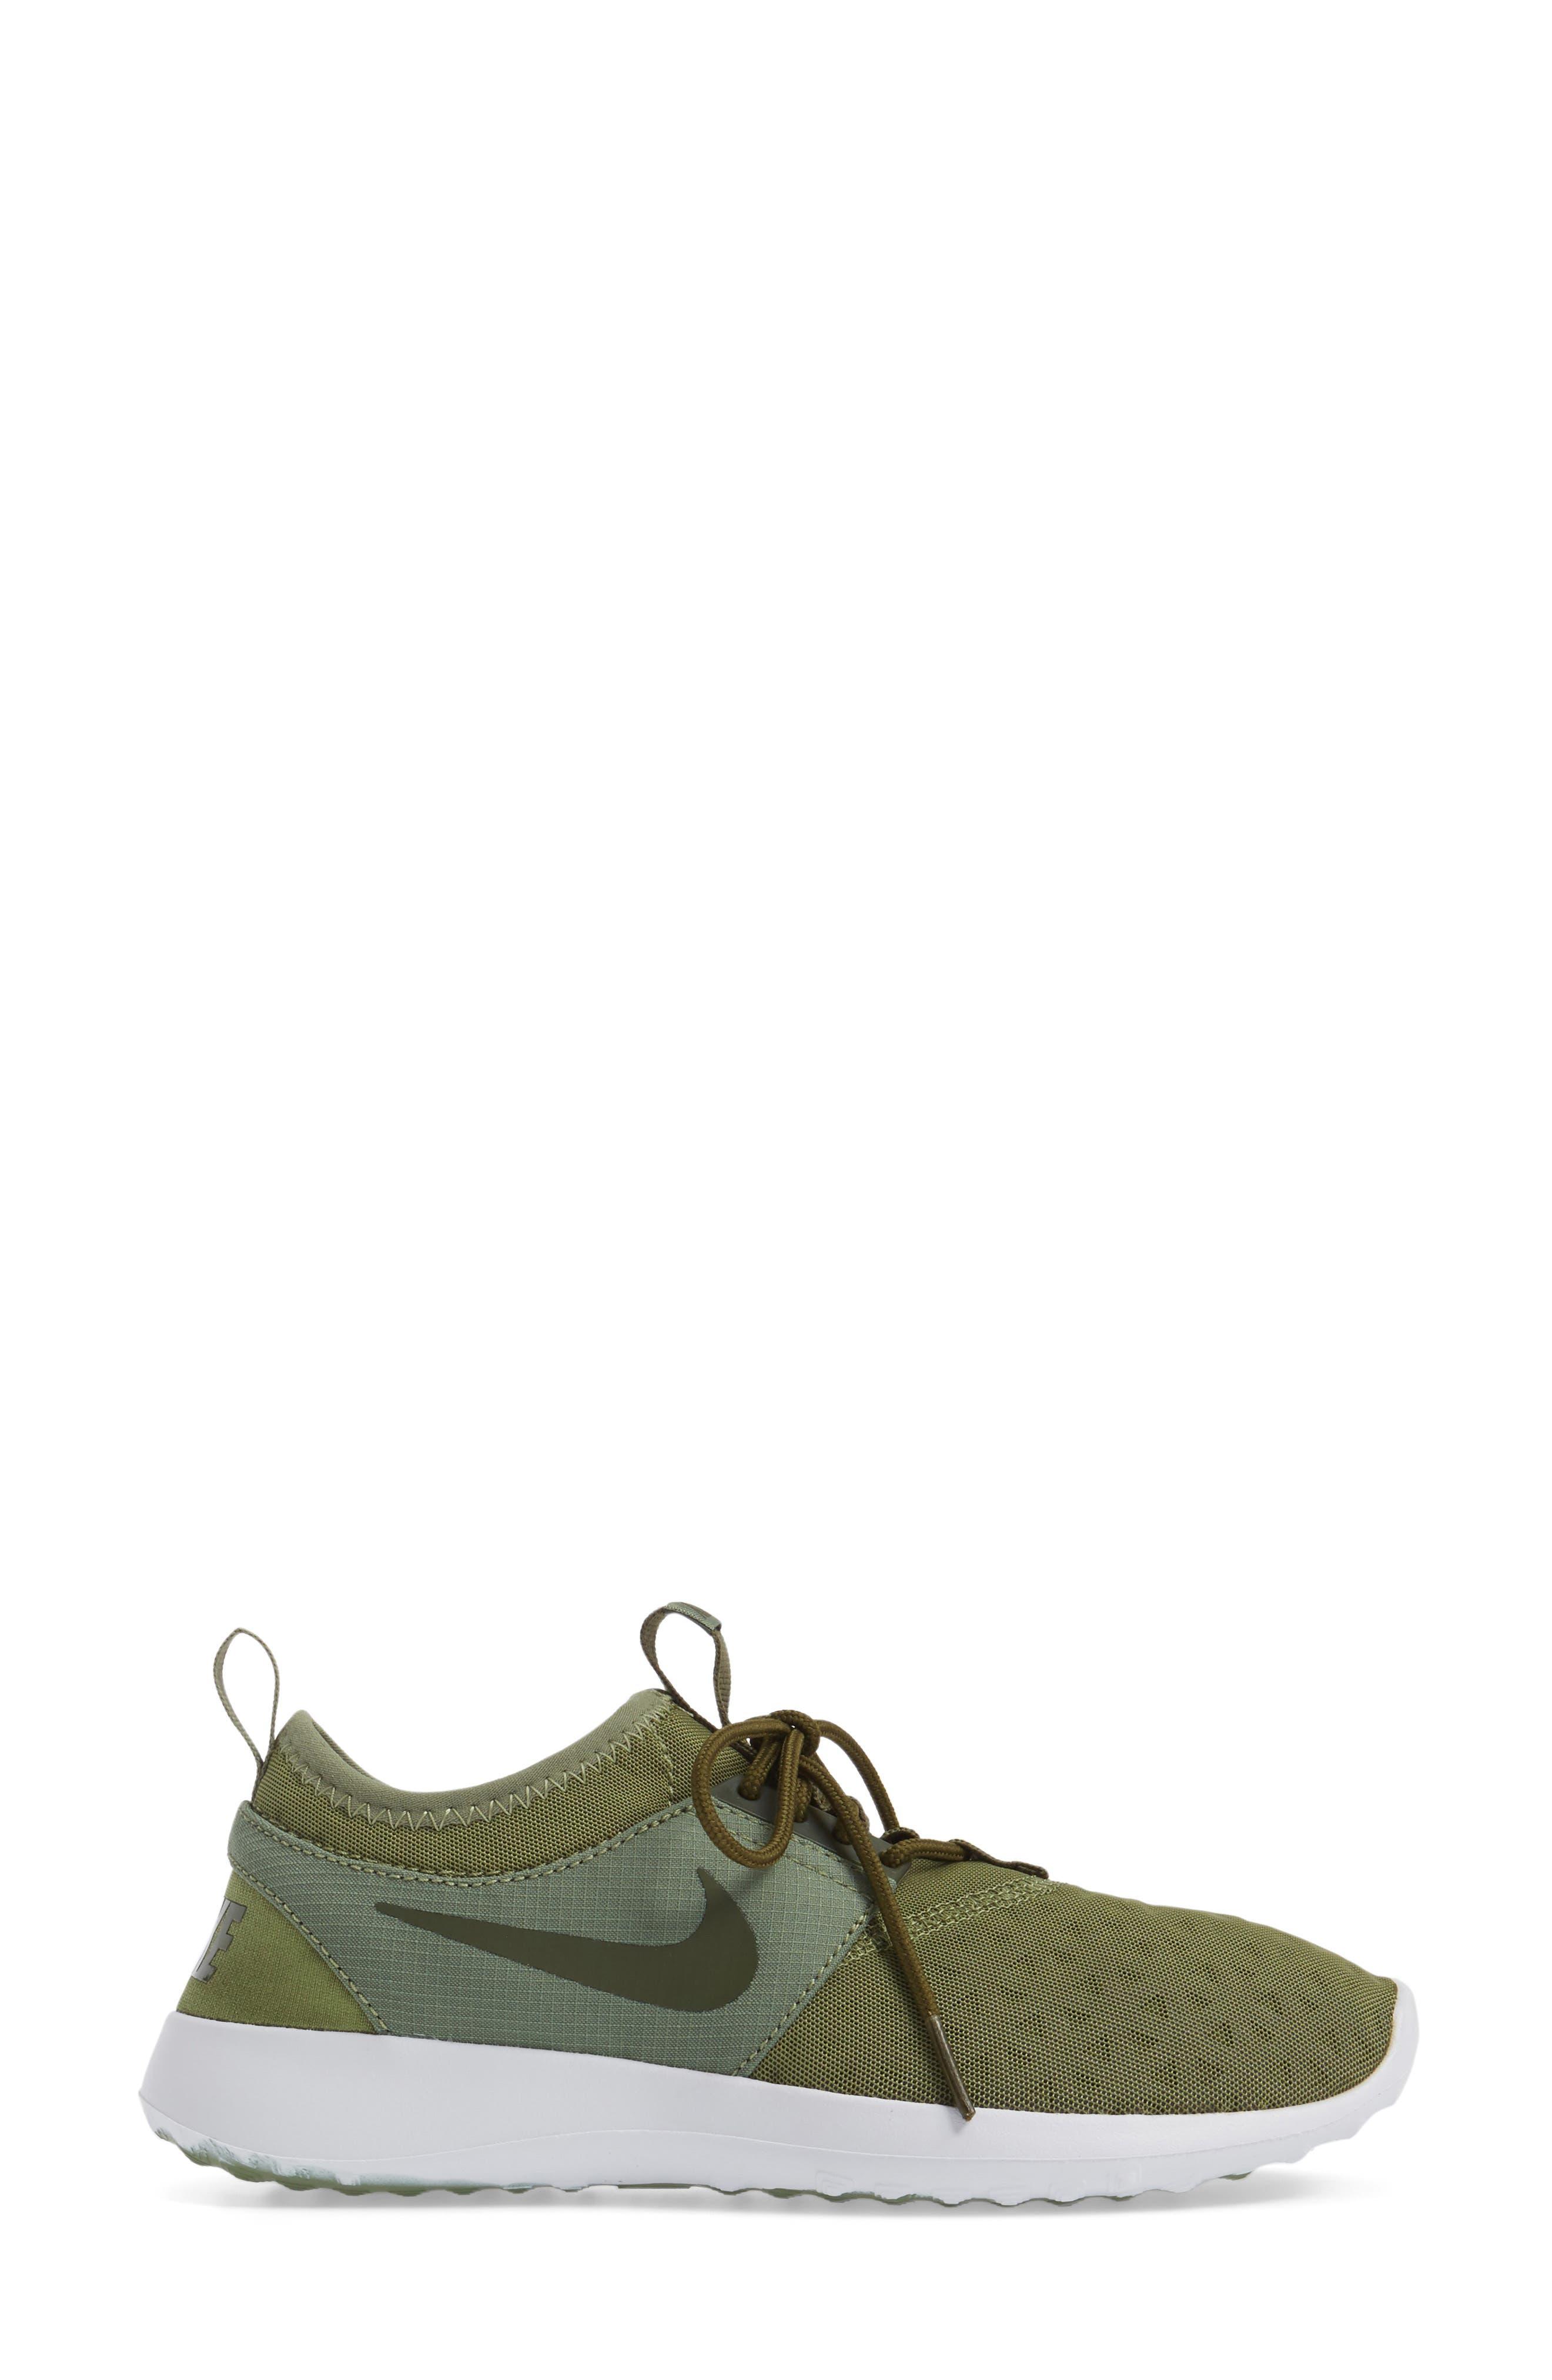 Juvenate Sneaker,                             Alternate thumbnail 144, color,